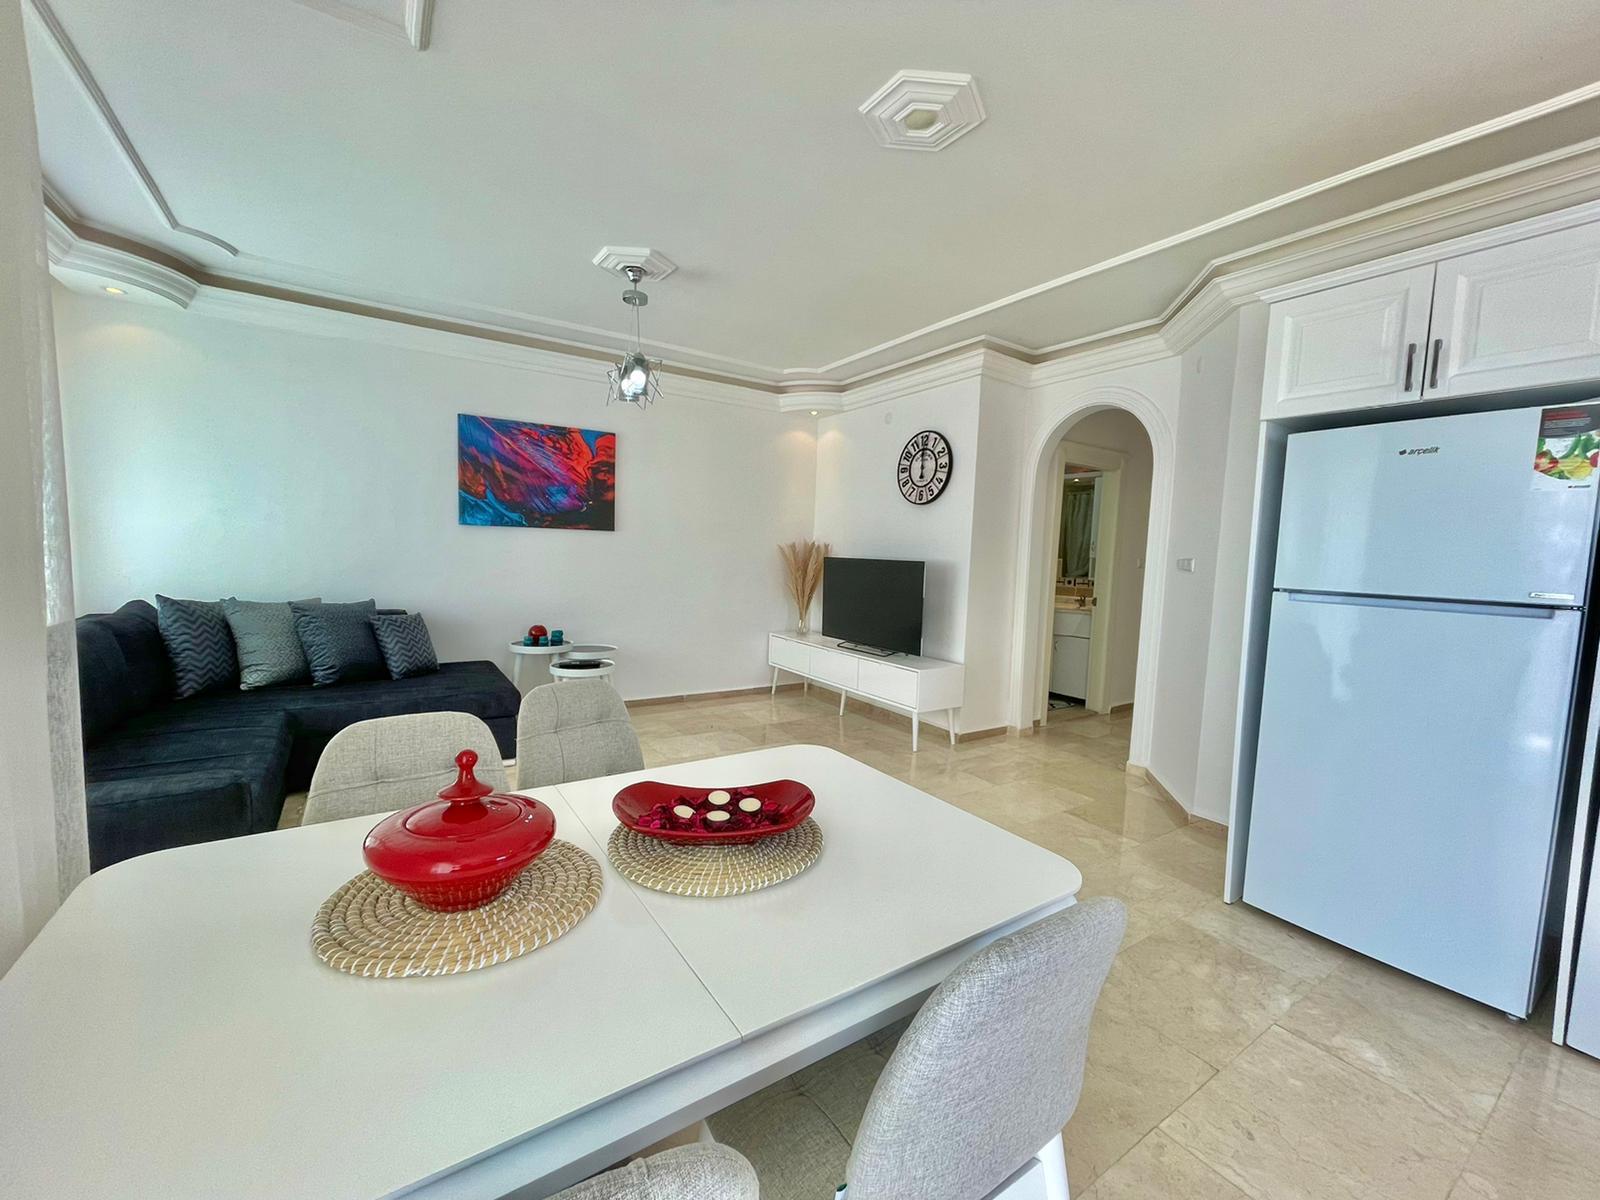 Трёхкомнатная квартира в «двух шагах» от Средиземного моря - Фото 14